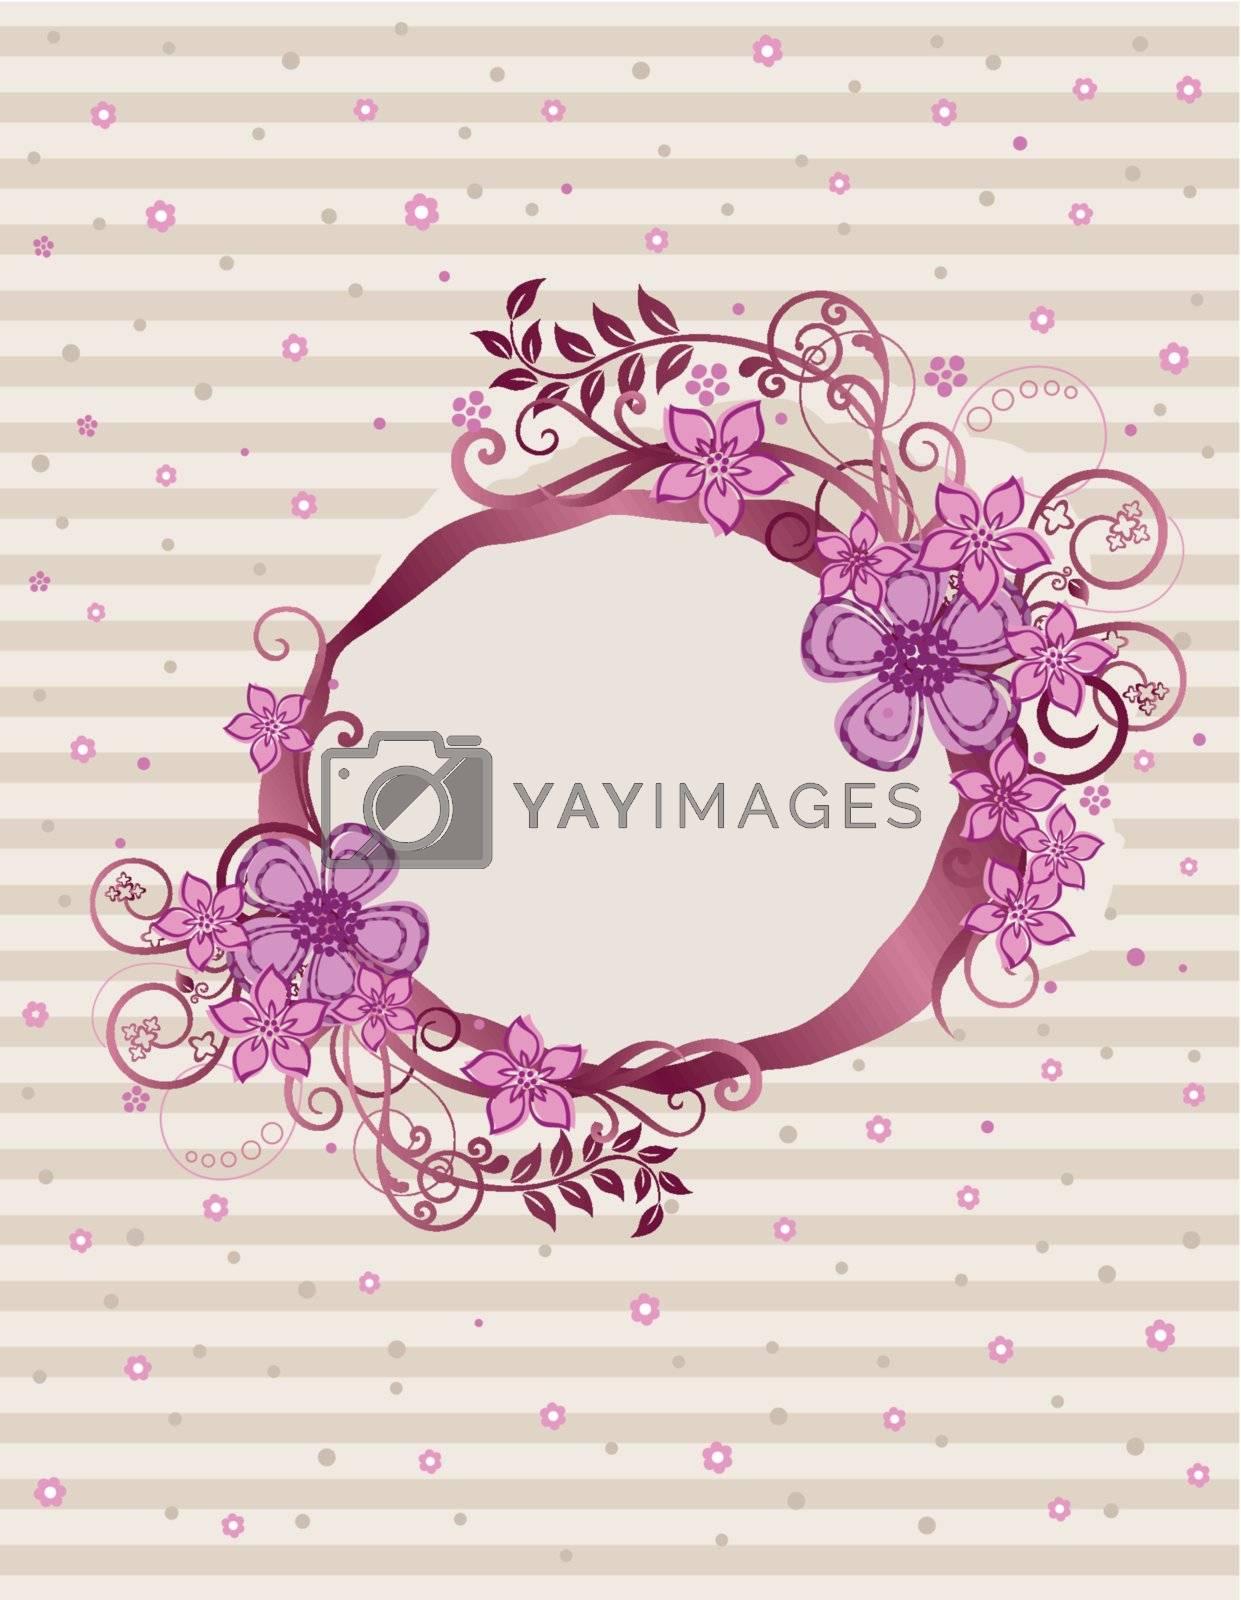 Floral pink oval frame design. This image is a vector illustration. Please visit my portfolio for more similar illustrations.